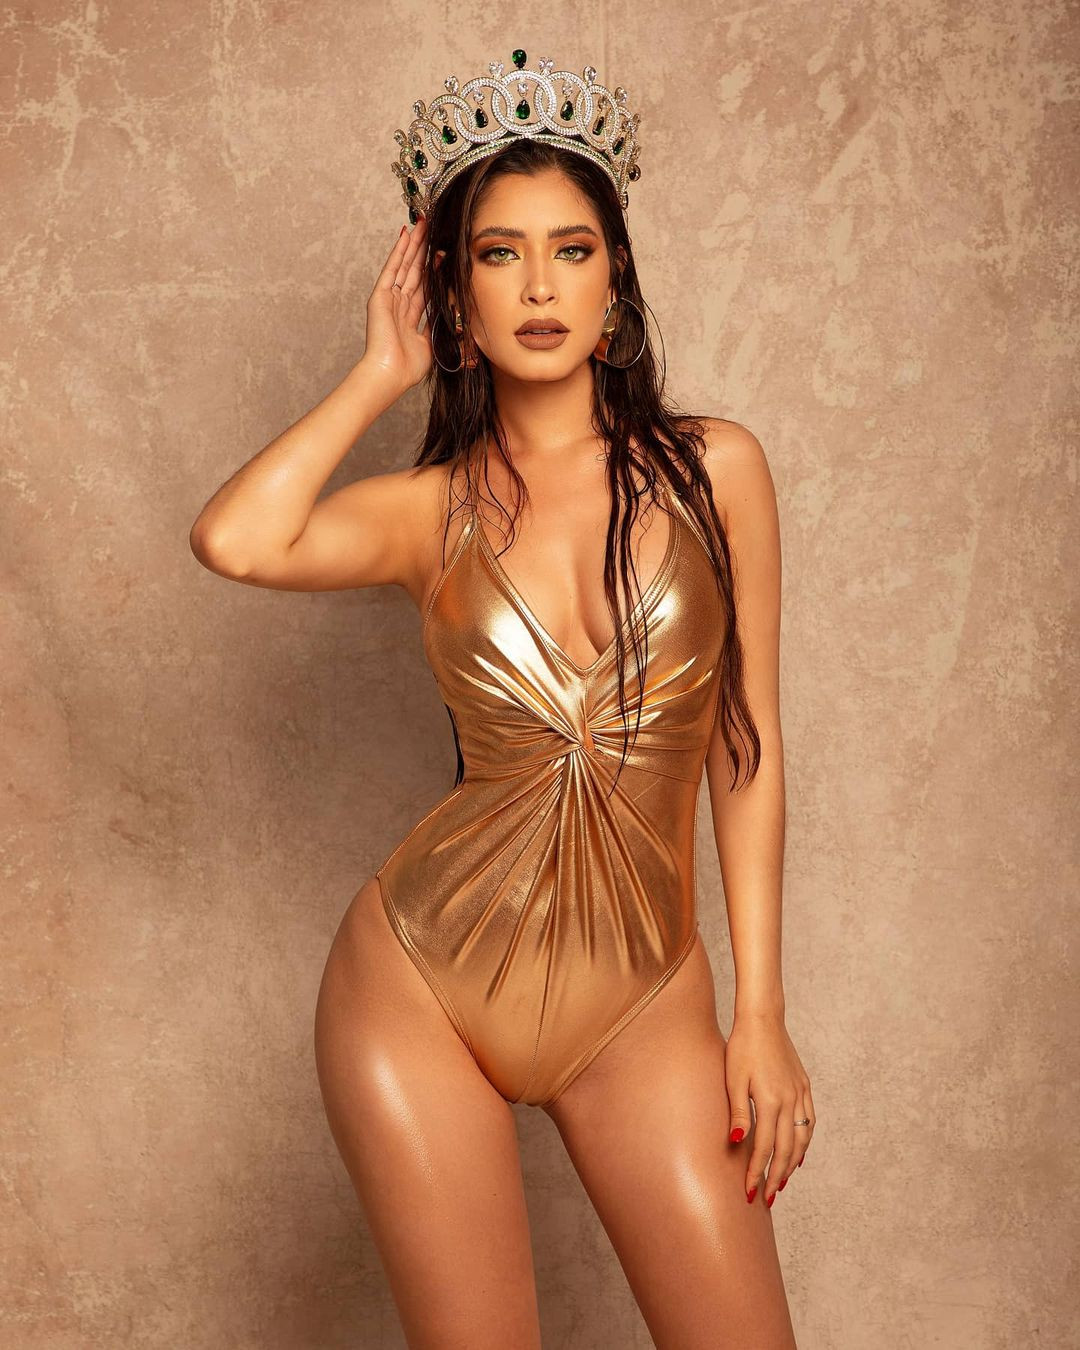 angela leon yuriar, miss grand mexico 2020. - Página 9 Fxoox410